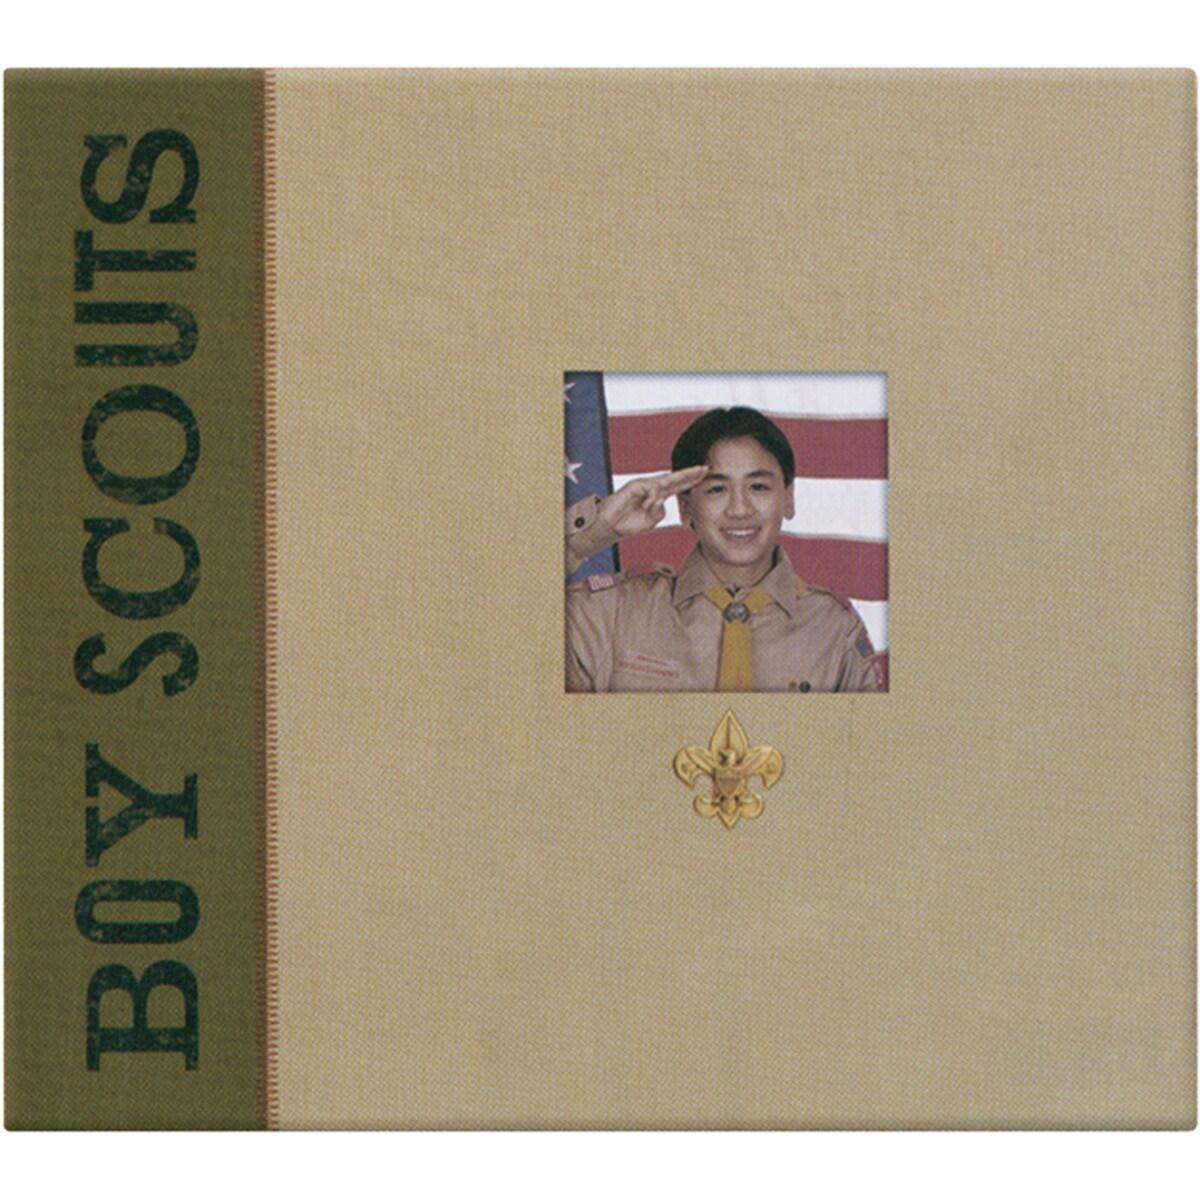 Postbound Boy Scouts Scrapbook Album 11139423